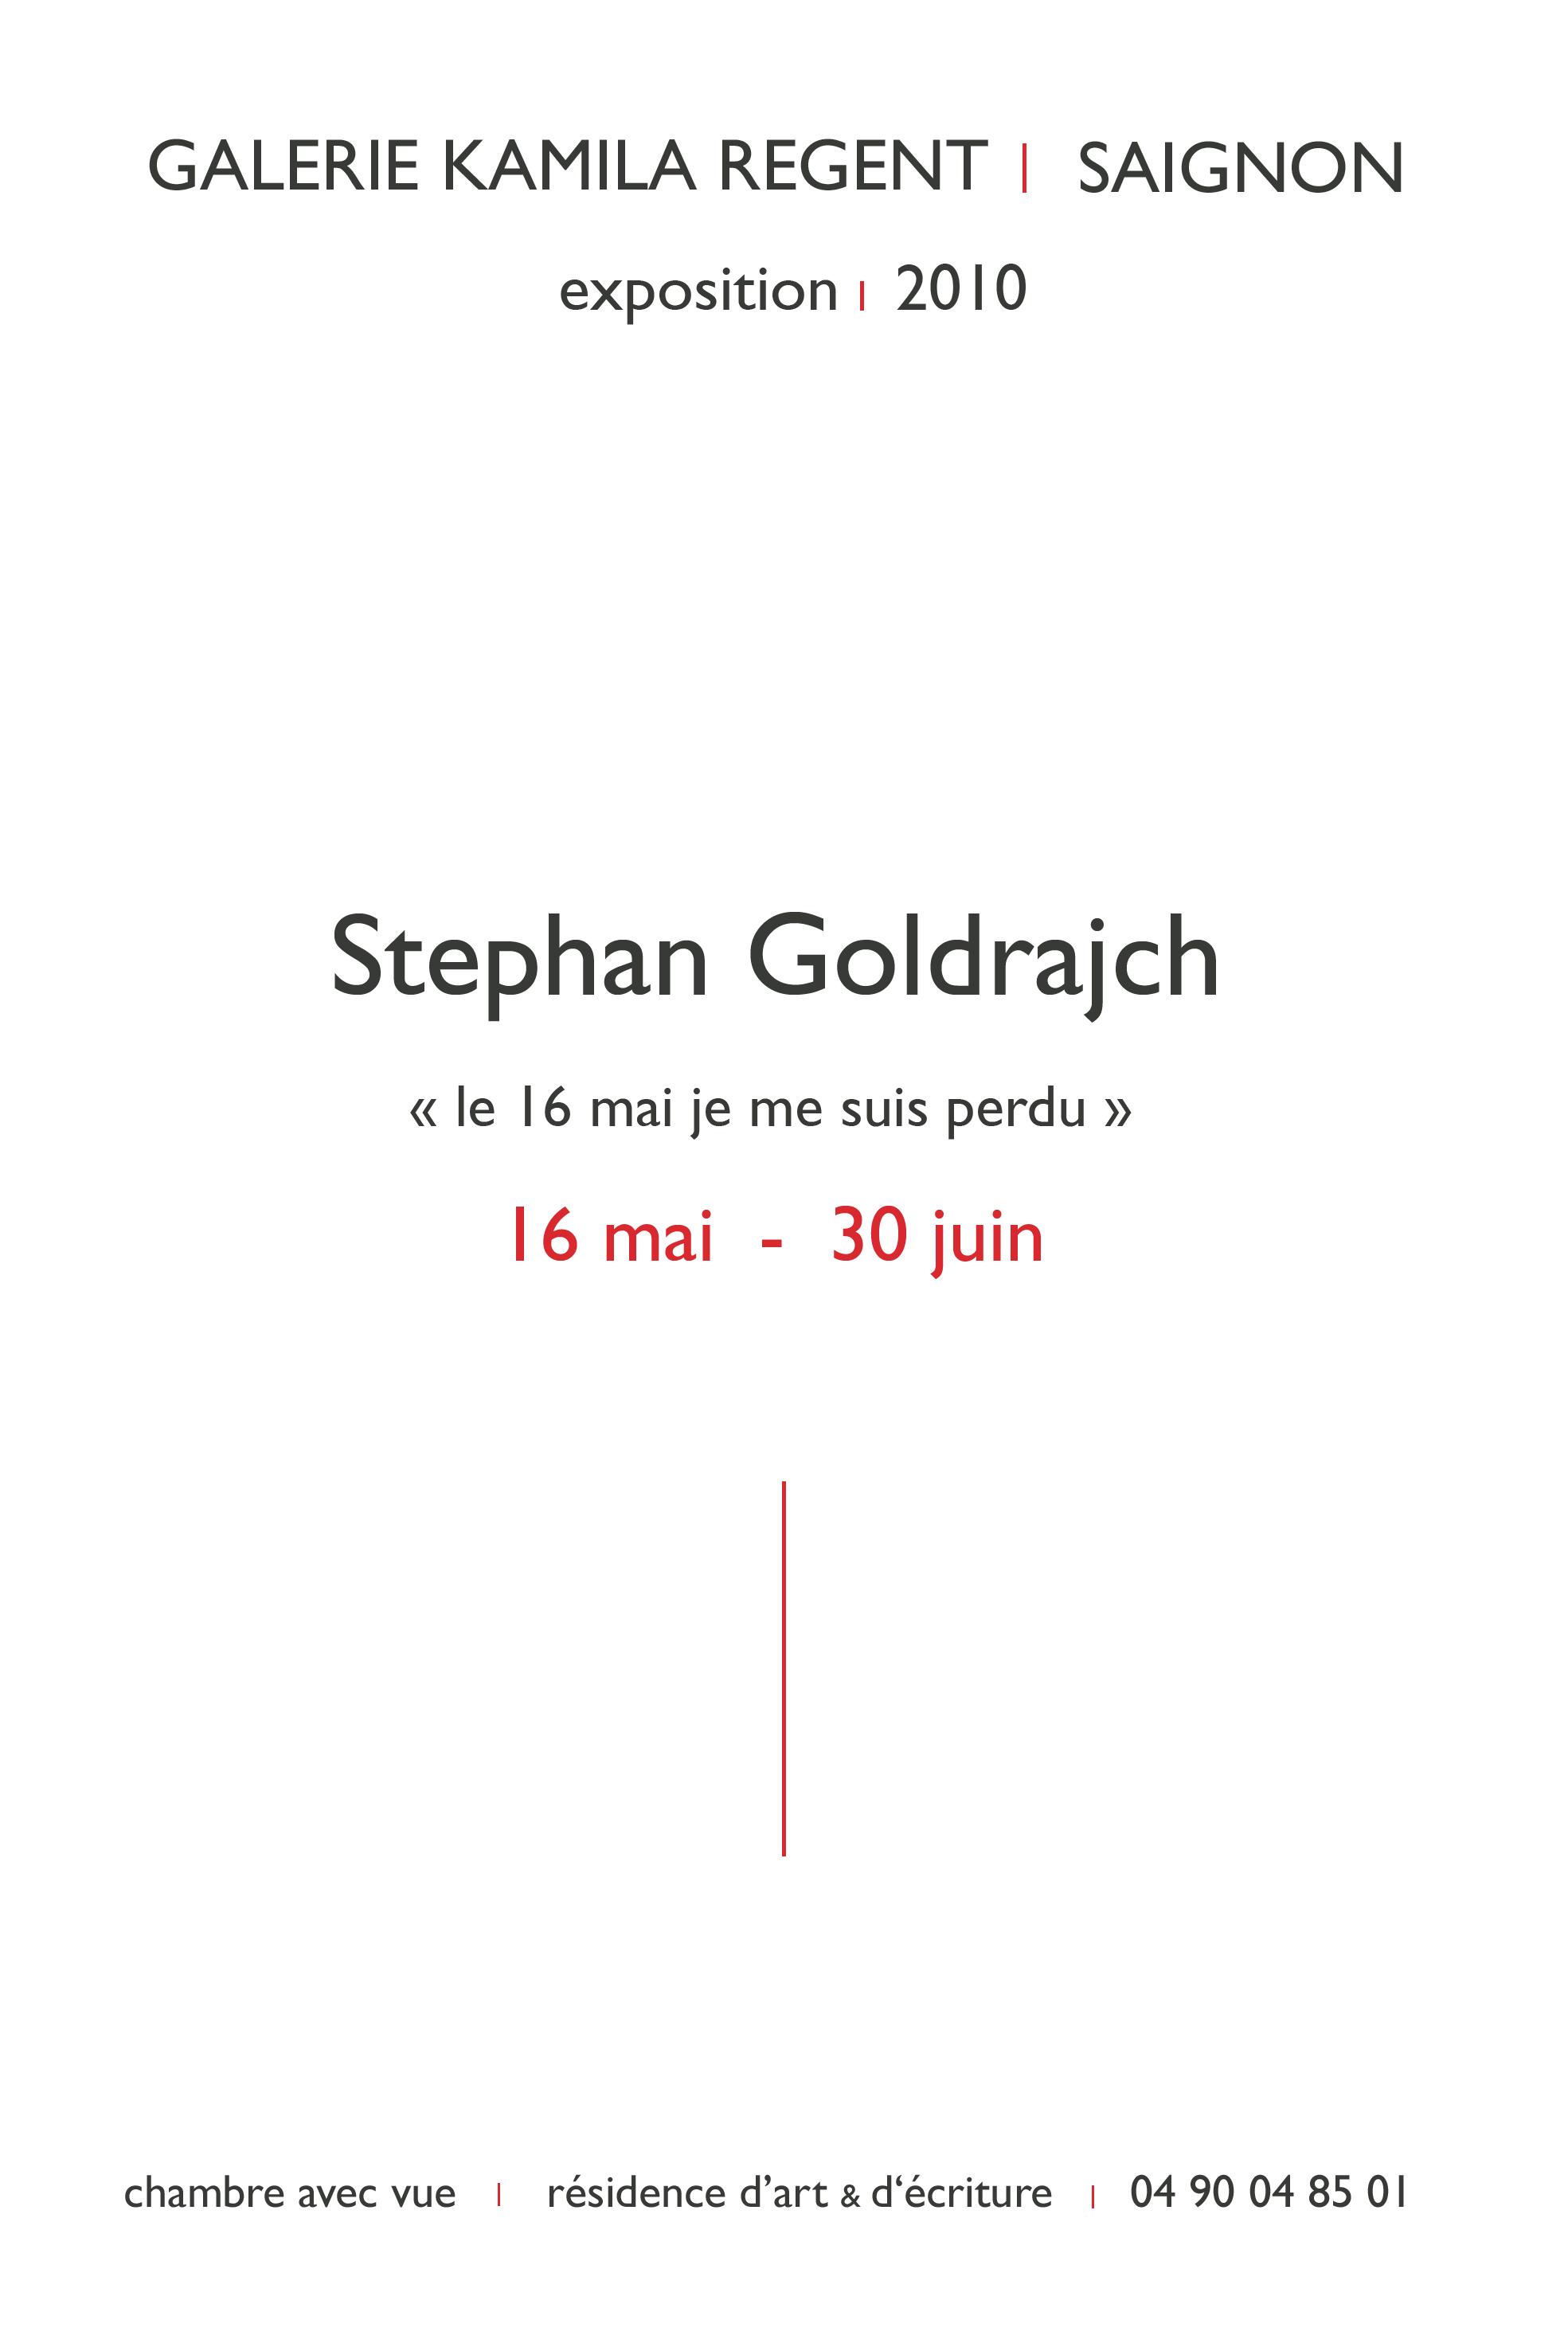 Stephane Goldrajch | Galerie Regent